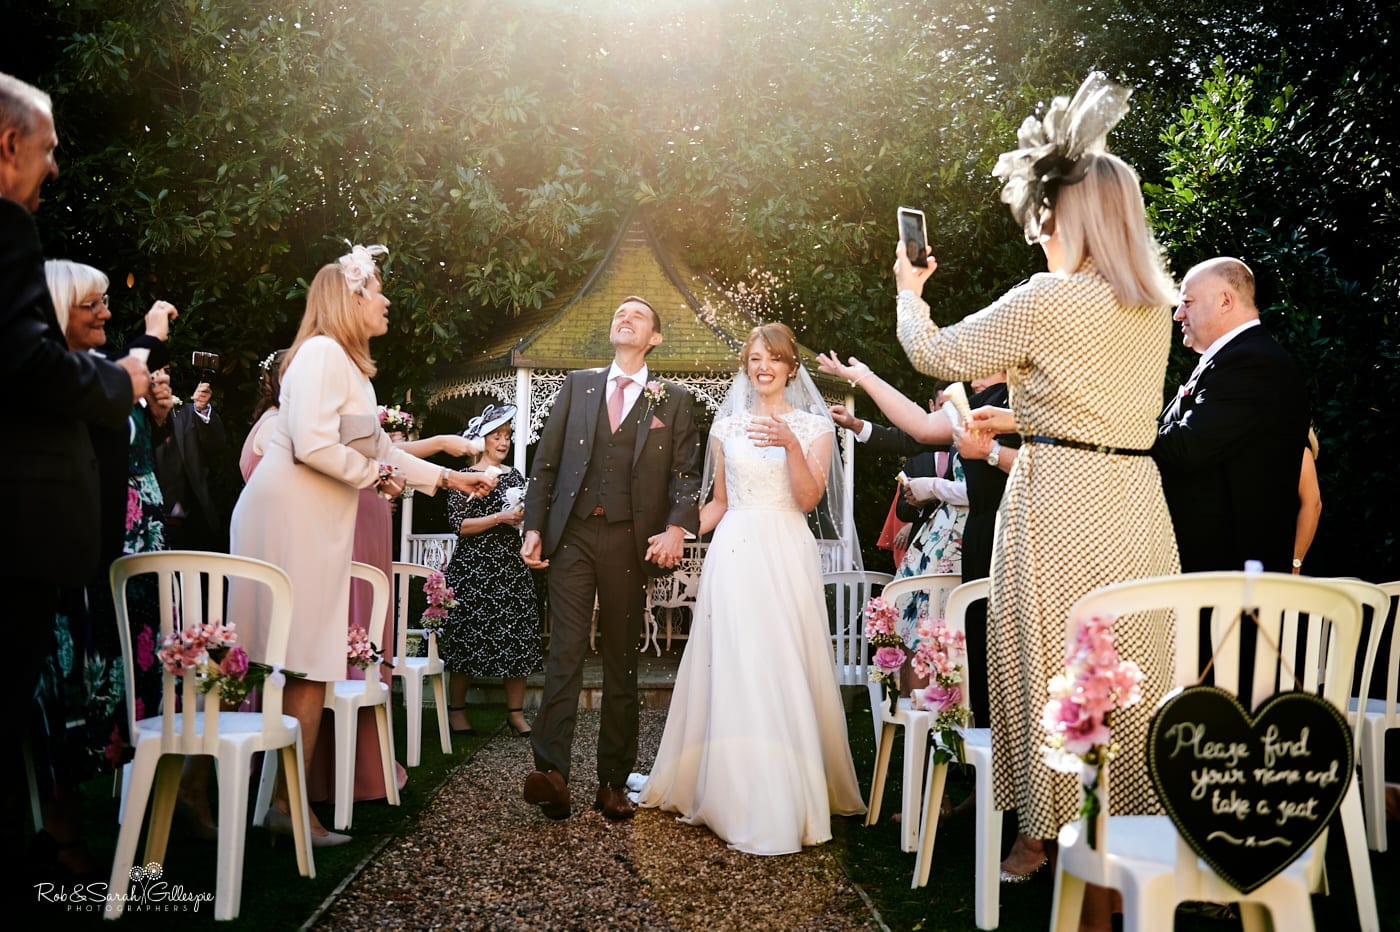 Bride and groom walk through confetti thrown by wedding guests